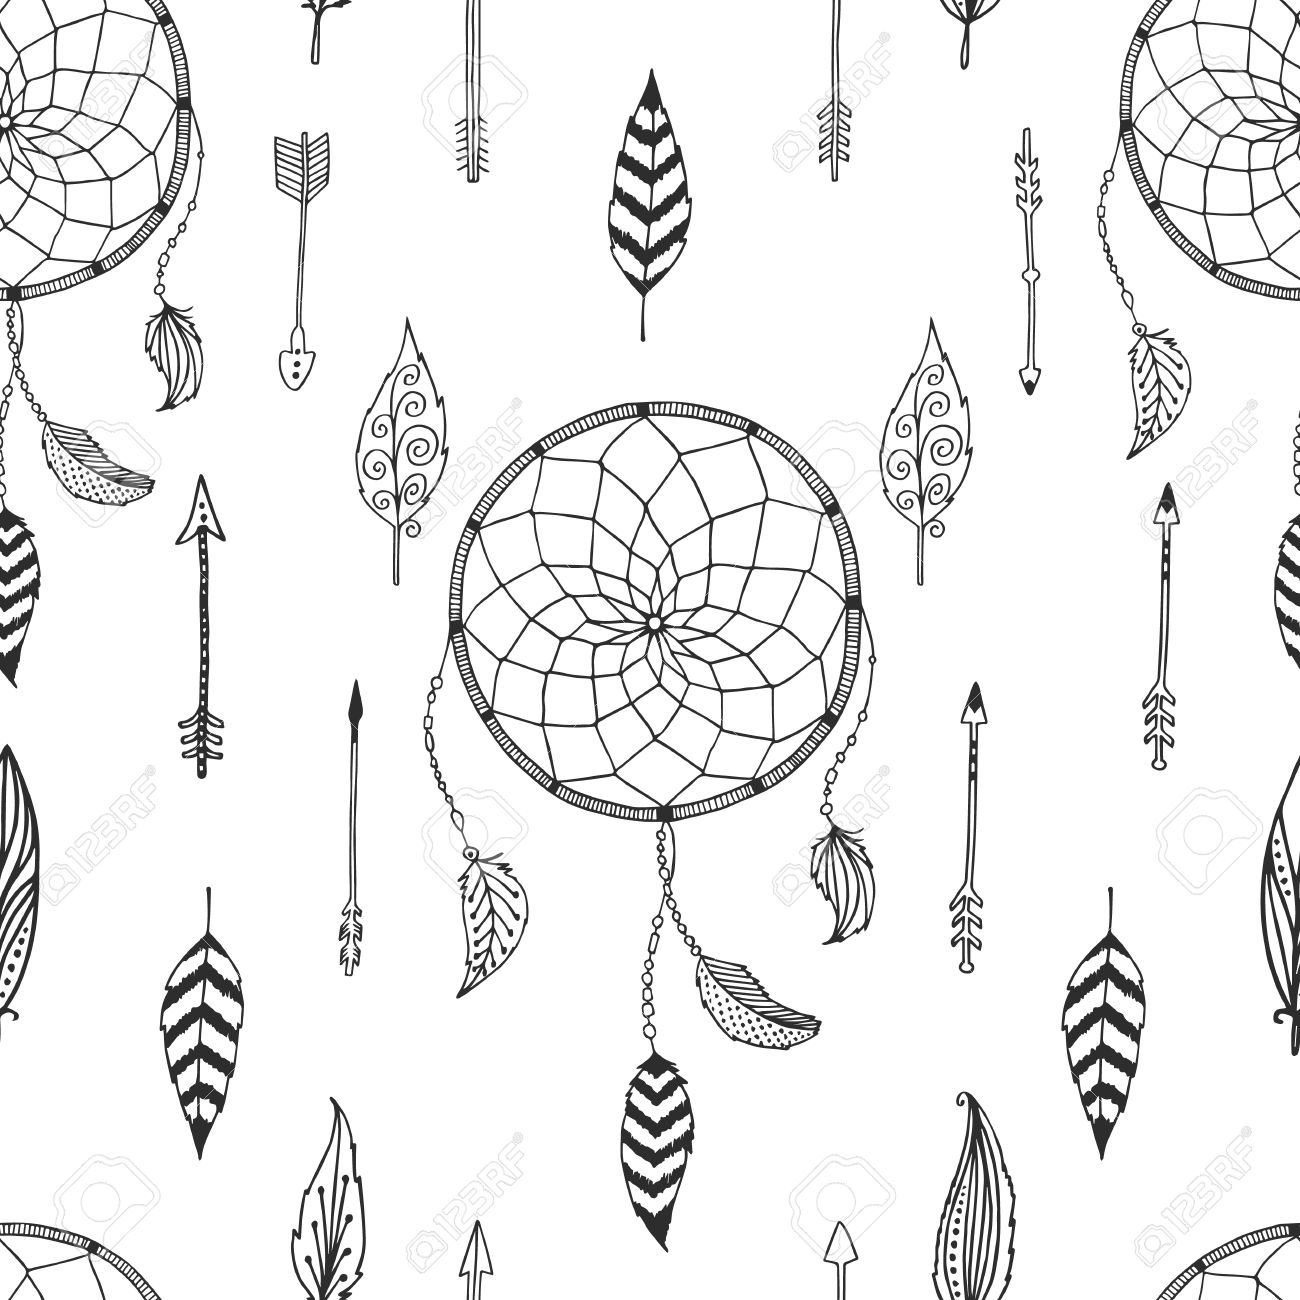 1300x1300 Drawn Dreamcatcher Pattern